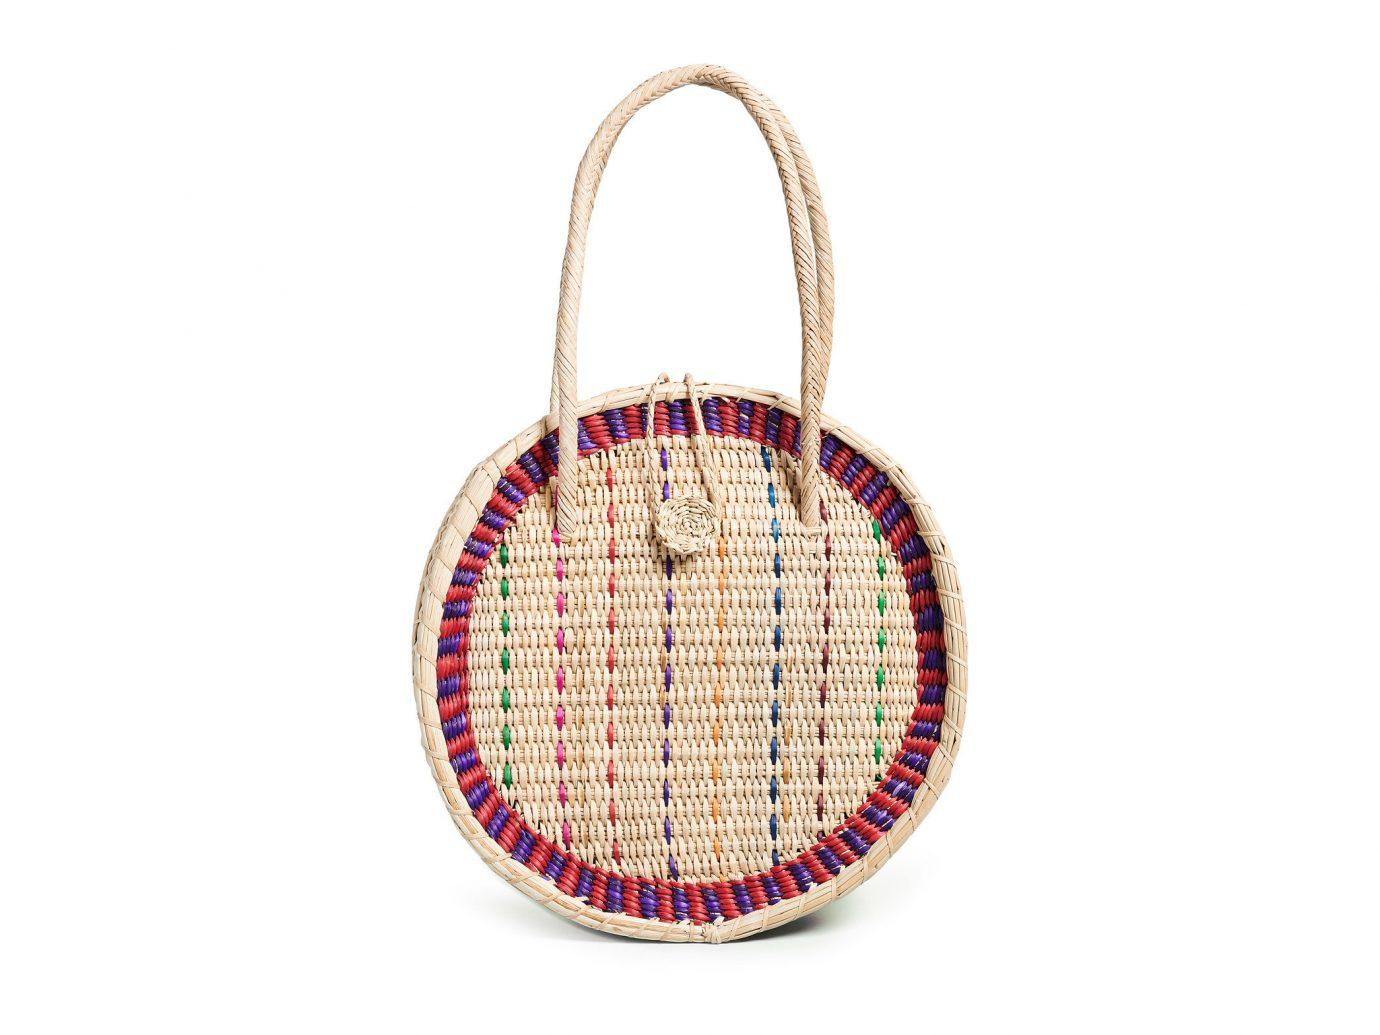 Packing Tips Style + Design Travel Shop handbag fashion accessory product bag jewellery shoulder bag